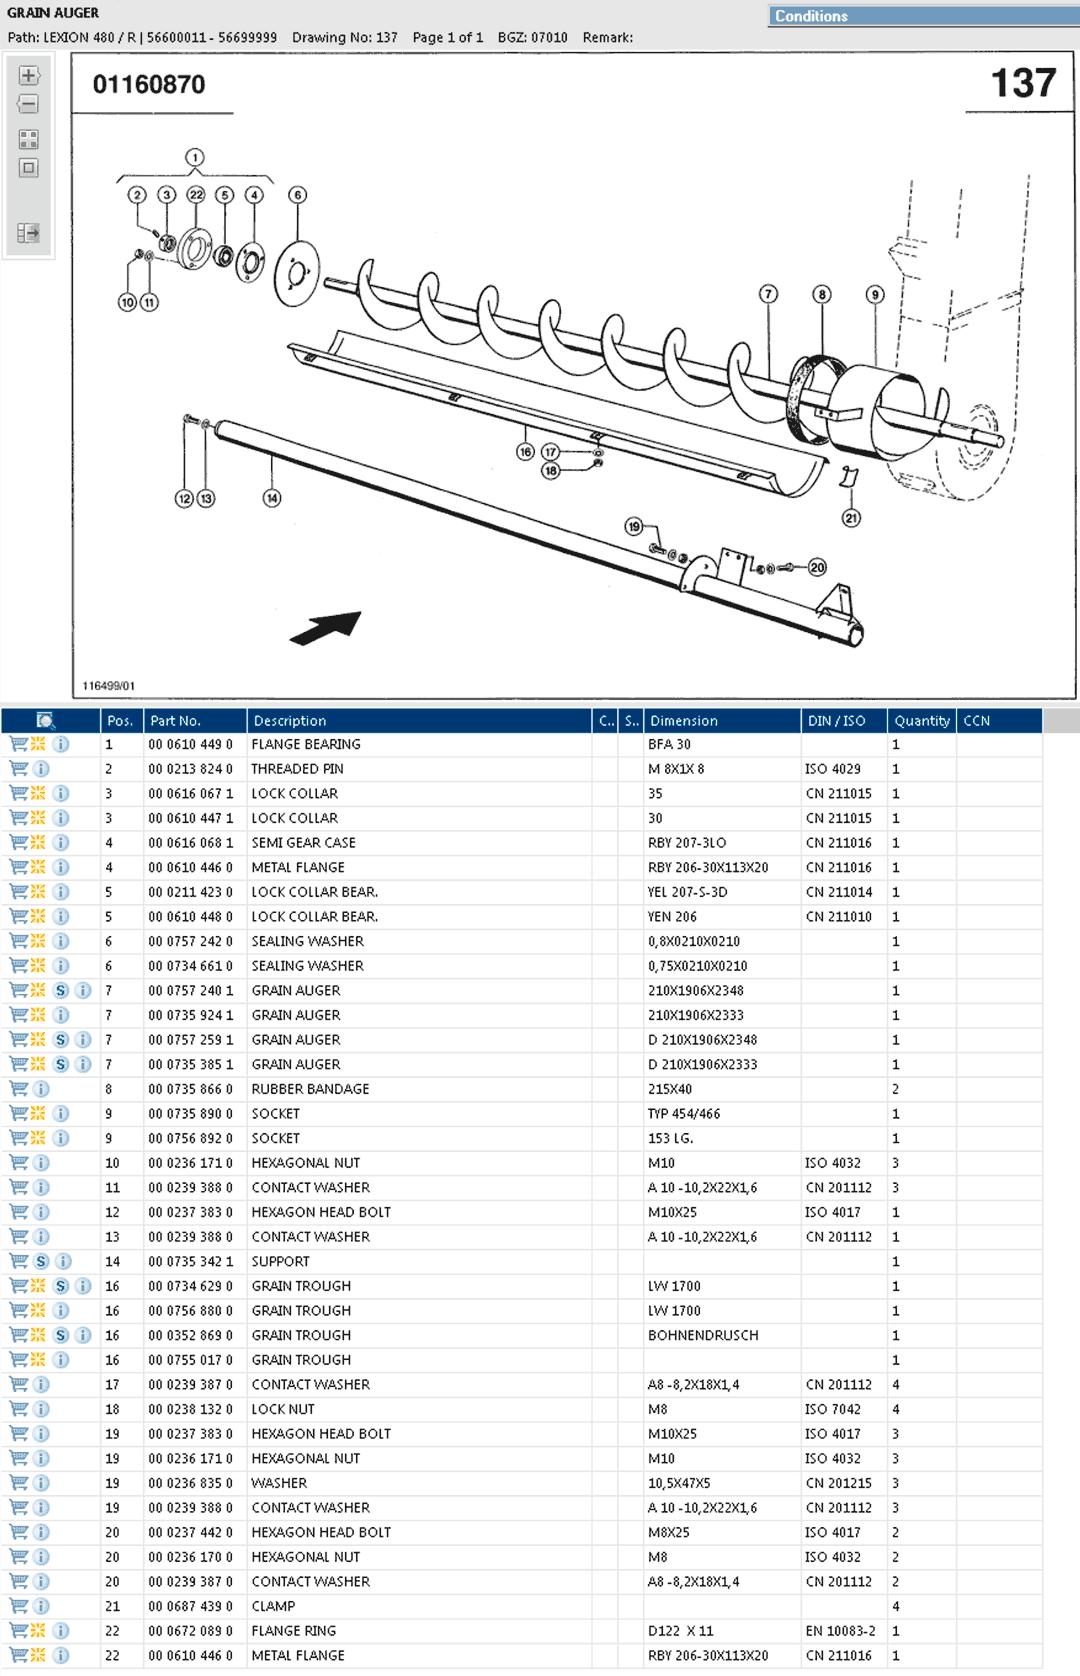 Lexion 480R parts and schemes - Grain tank filling auger